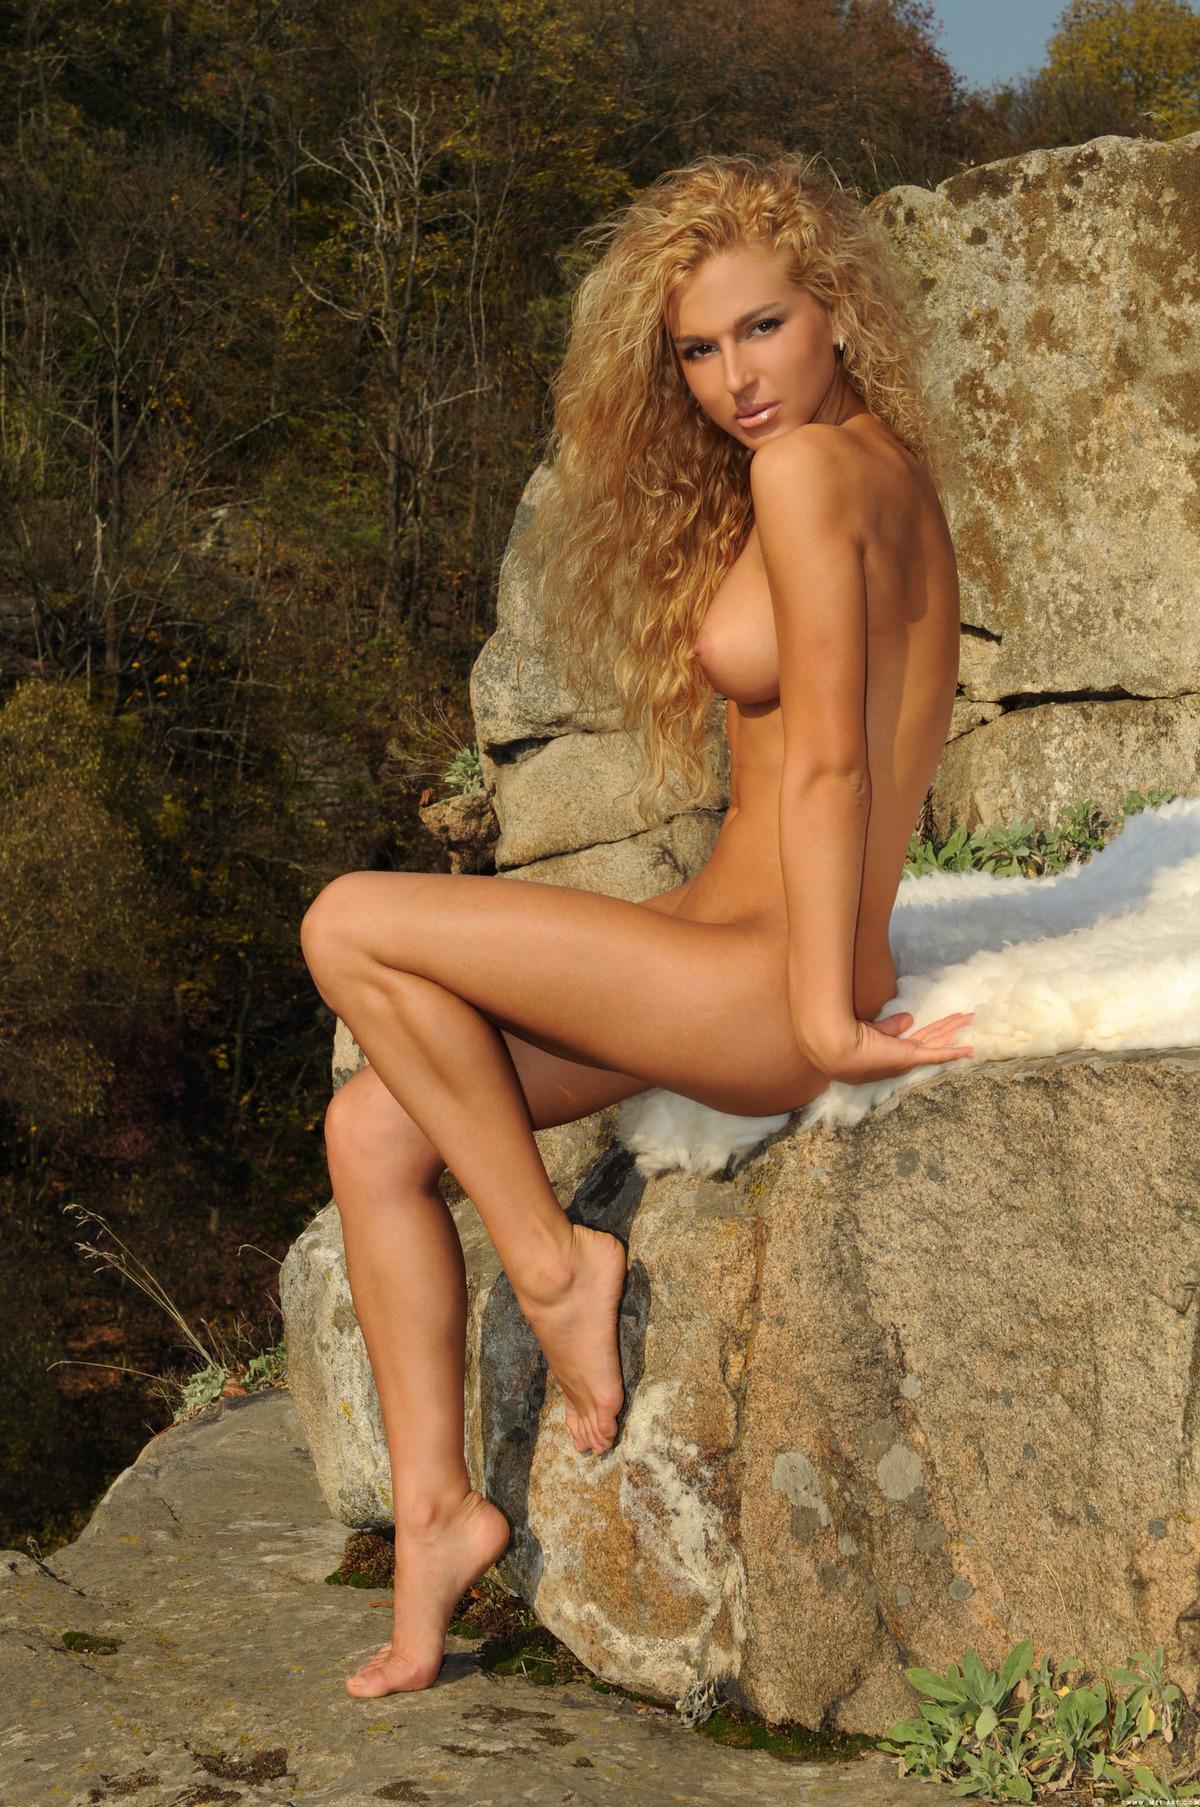 Ukrainian Blonde Beauty Katya Ad - picture 01